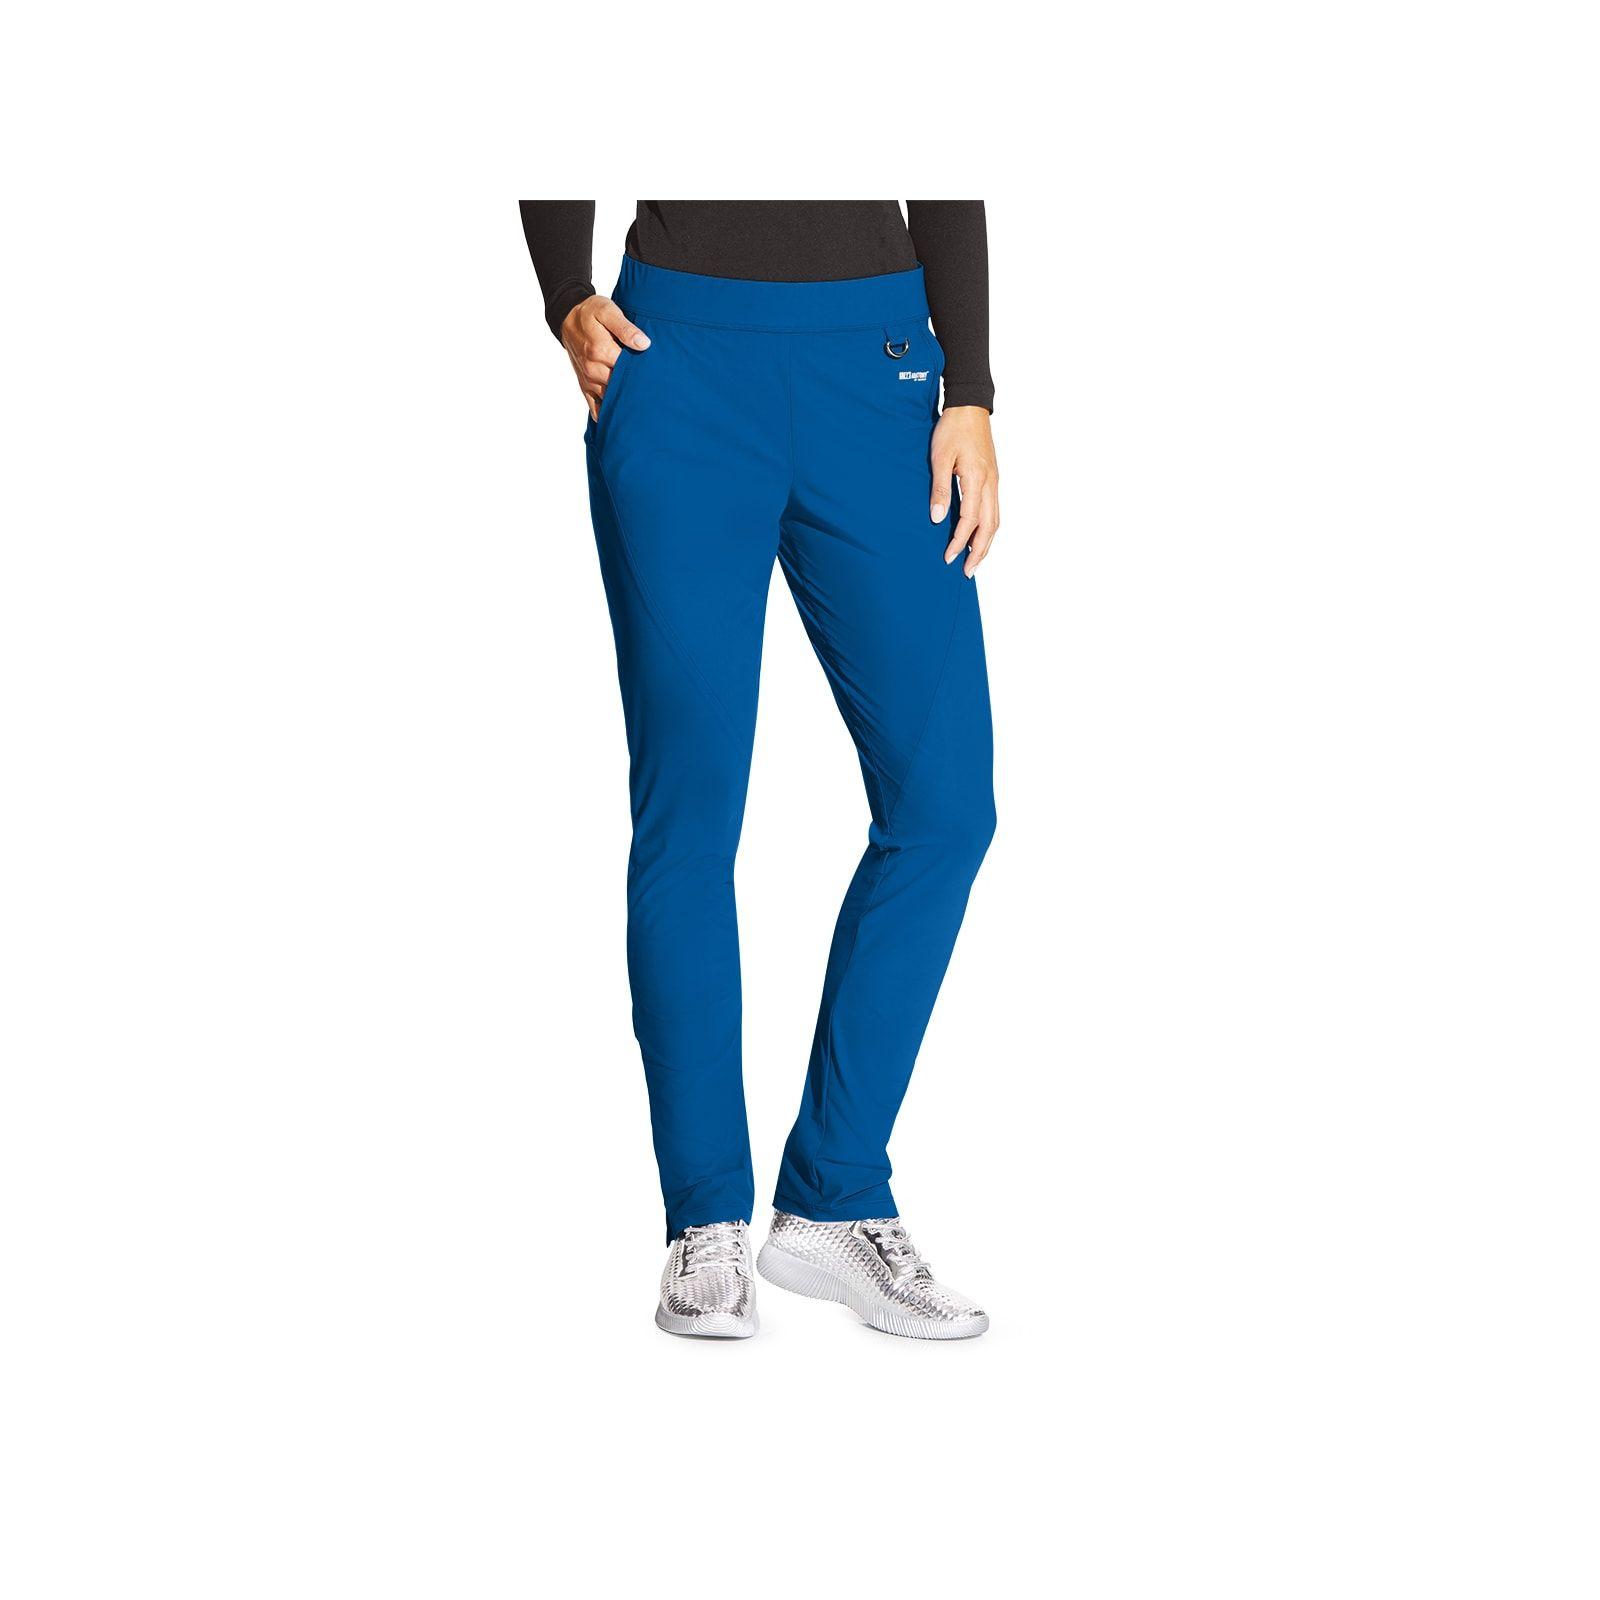 "Pantalon médical femme, couleur bleu royal vue de face, collection ""Grey's Anatomy Edge"" (GEP005-)"